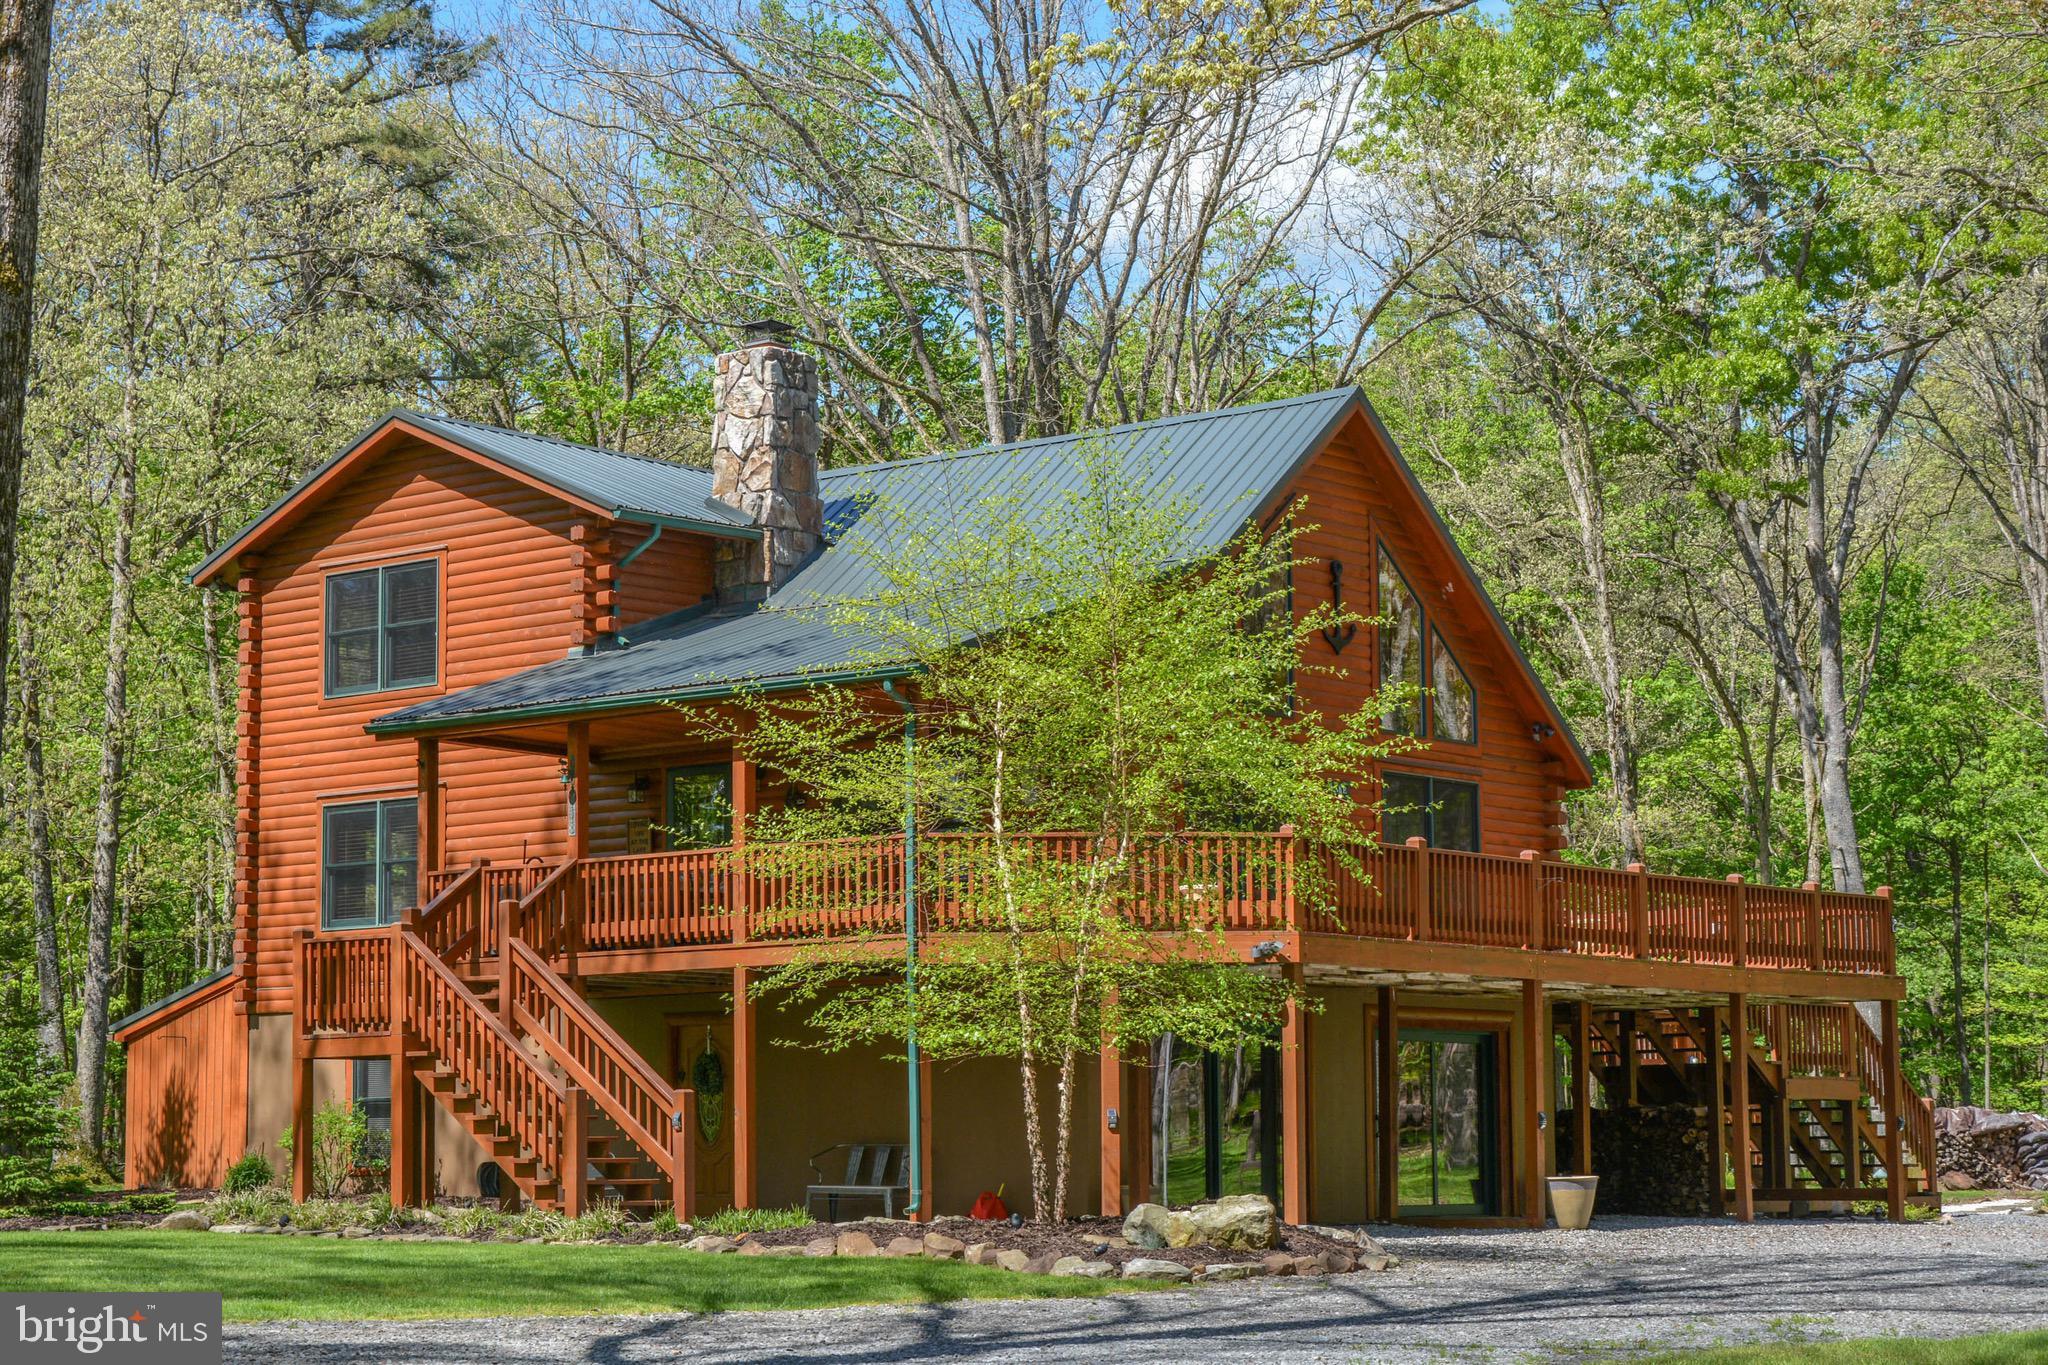 Log Homes & Cabins For Sale | Deep Creek Lake Homes For Sale